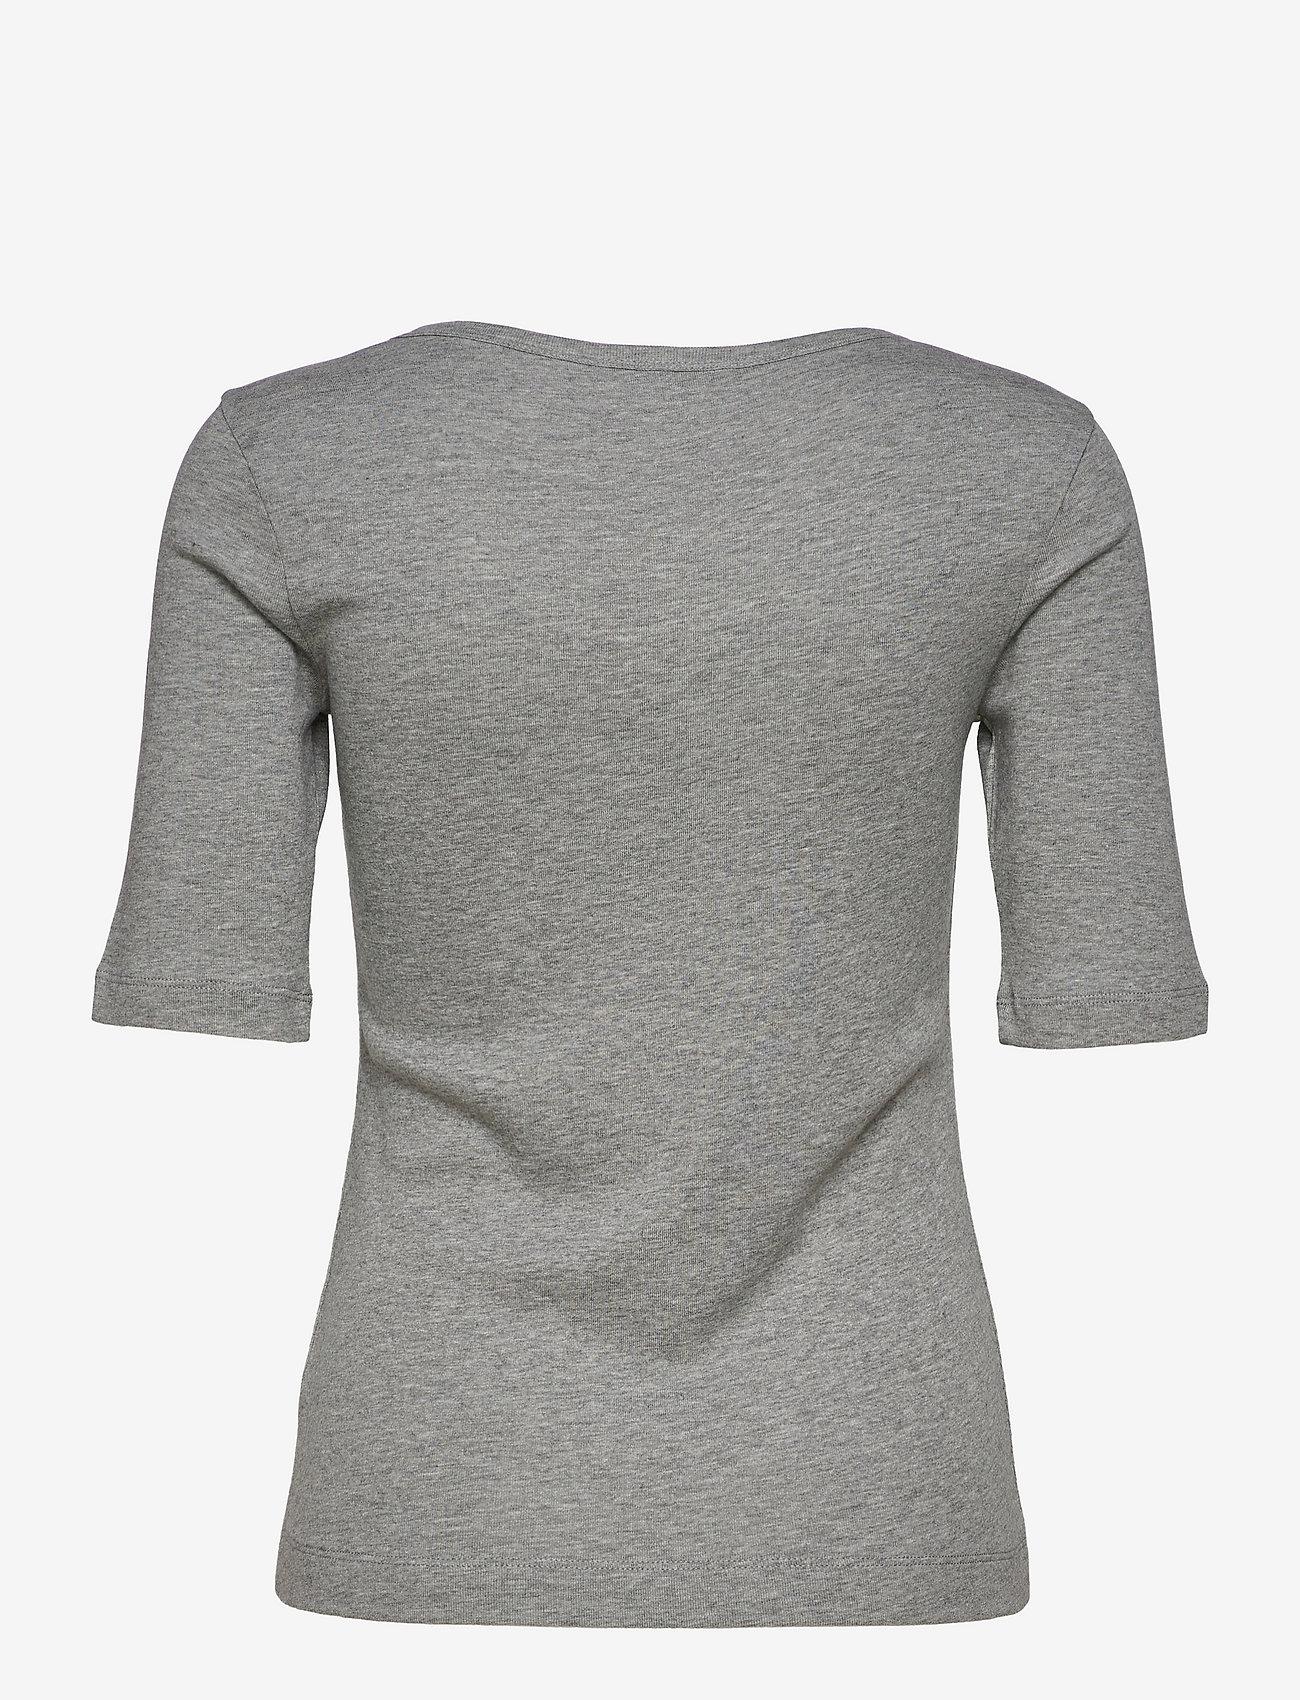 Tommy Hilfiger - SLIM SCOOP-NK COSY TOP 1/2 SLV - t-shirts - light grey heather - 1